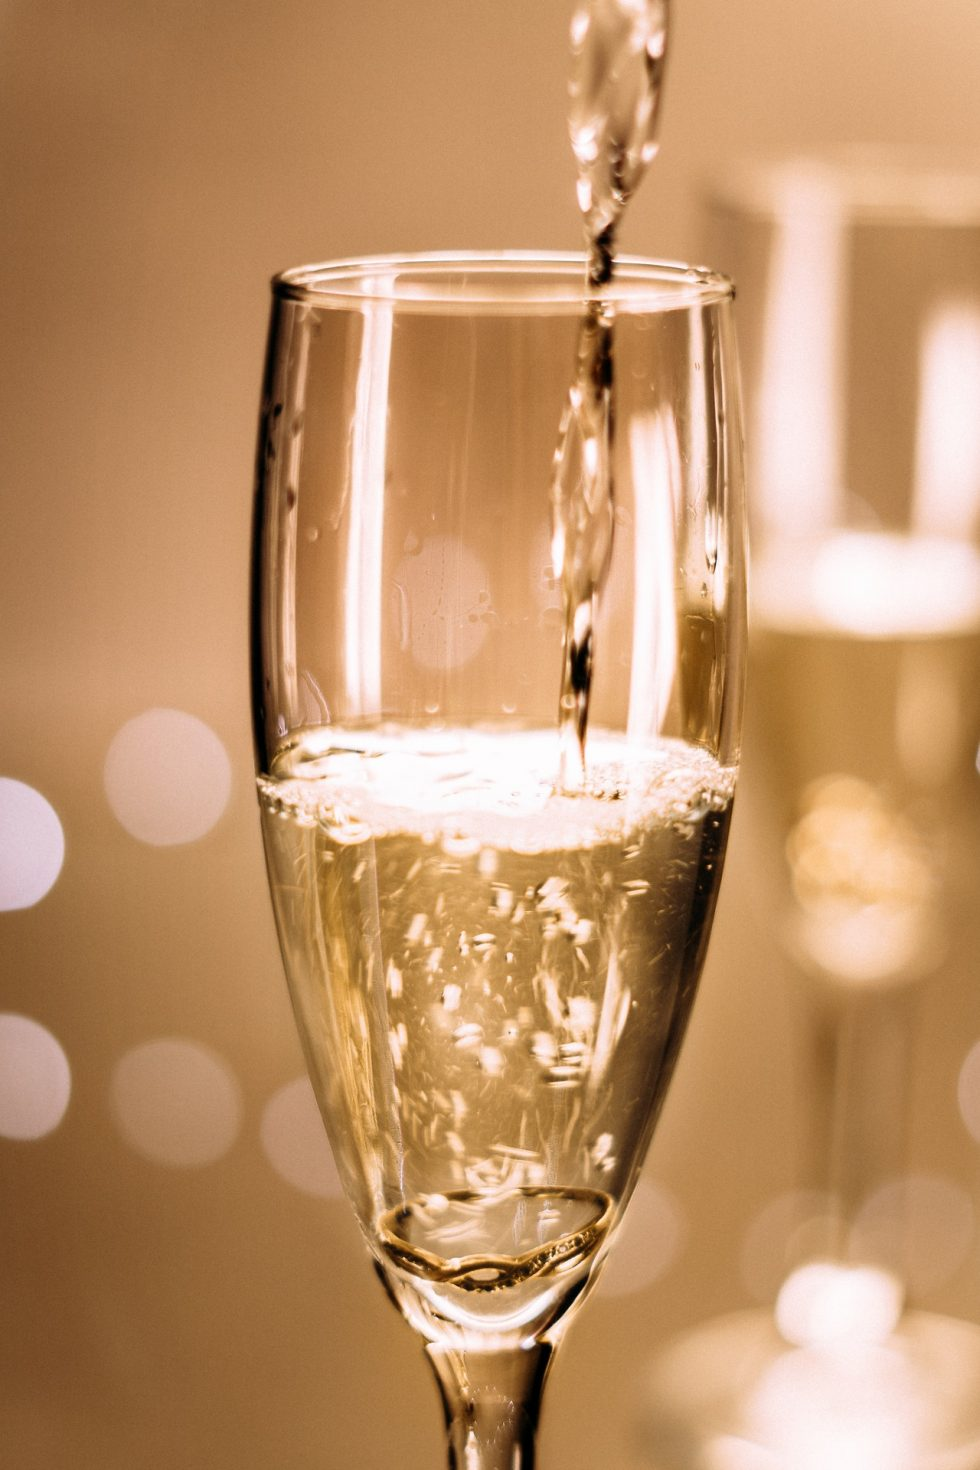 Champagne   Photo source: pexels.com